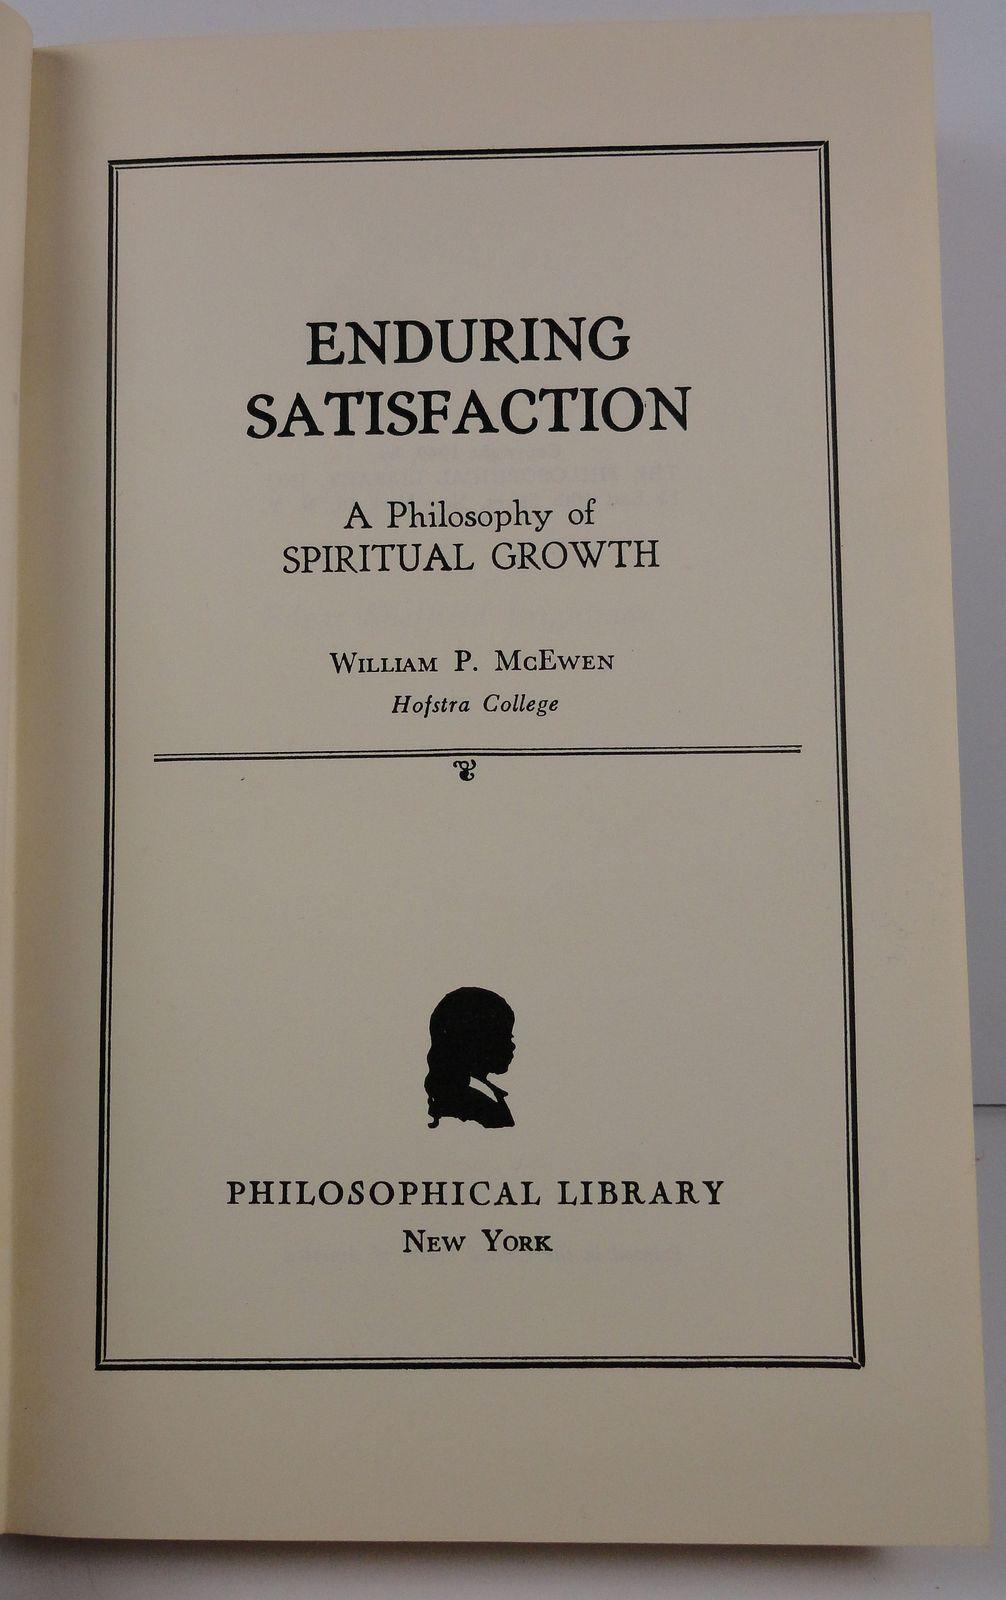 Enduring Satisfaction by William P. McEwen 1949